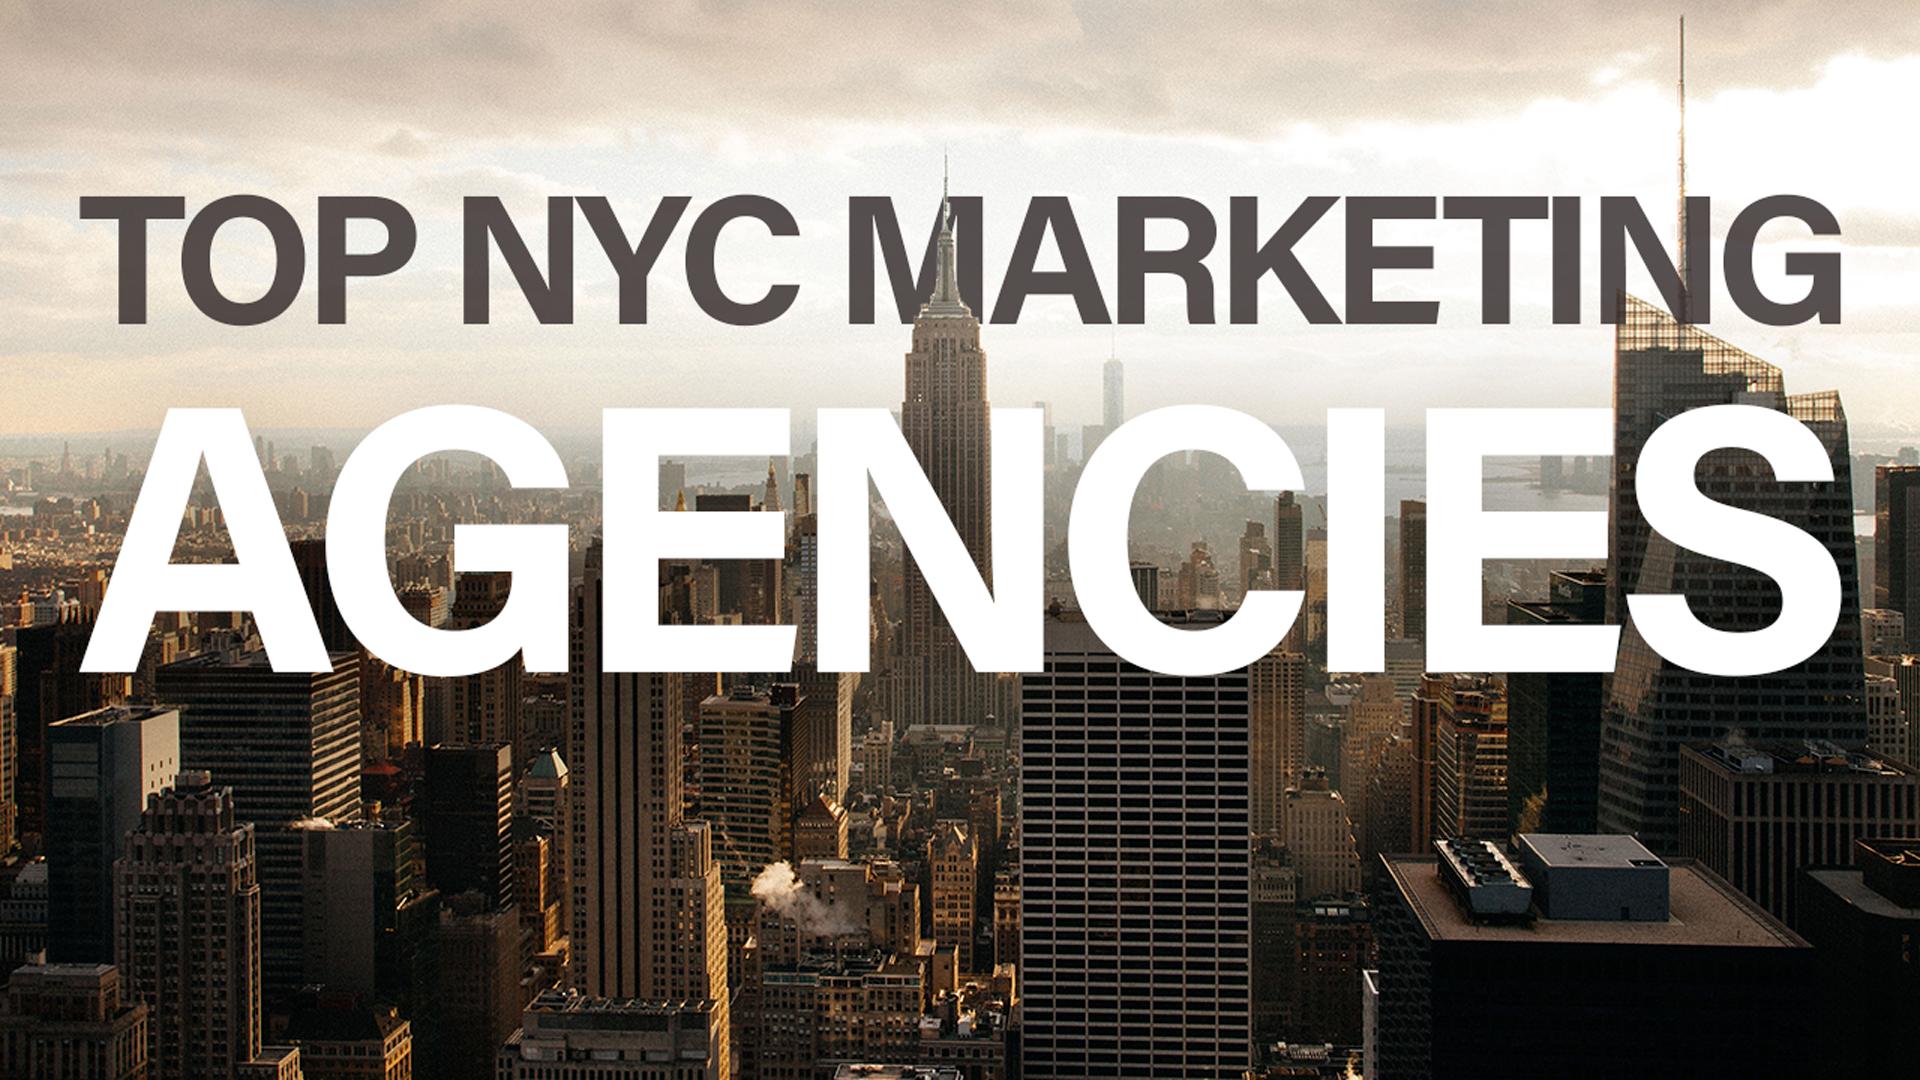 The Best Marketing Agencies in New York: Top NYC Agencies